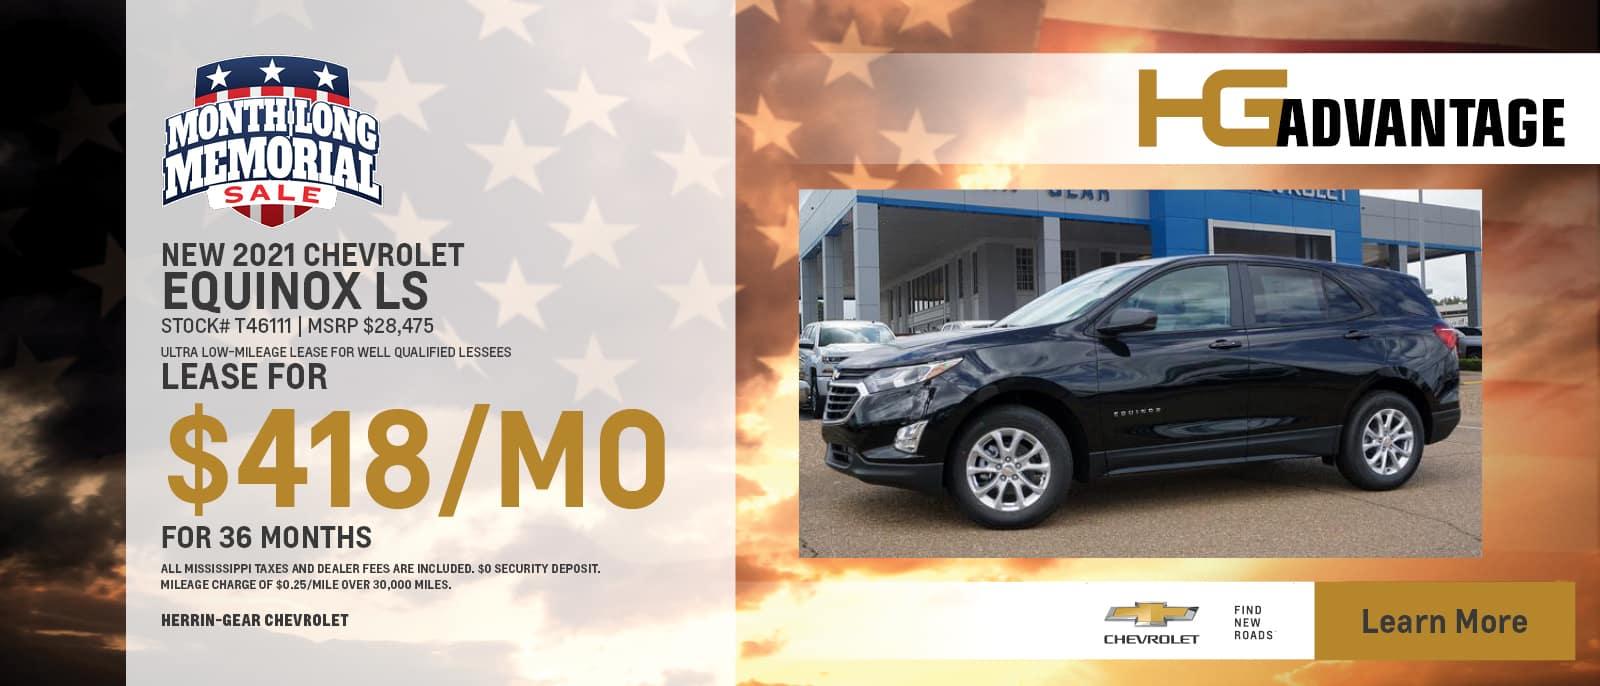 2021 Chevy Equinox LS